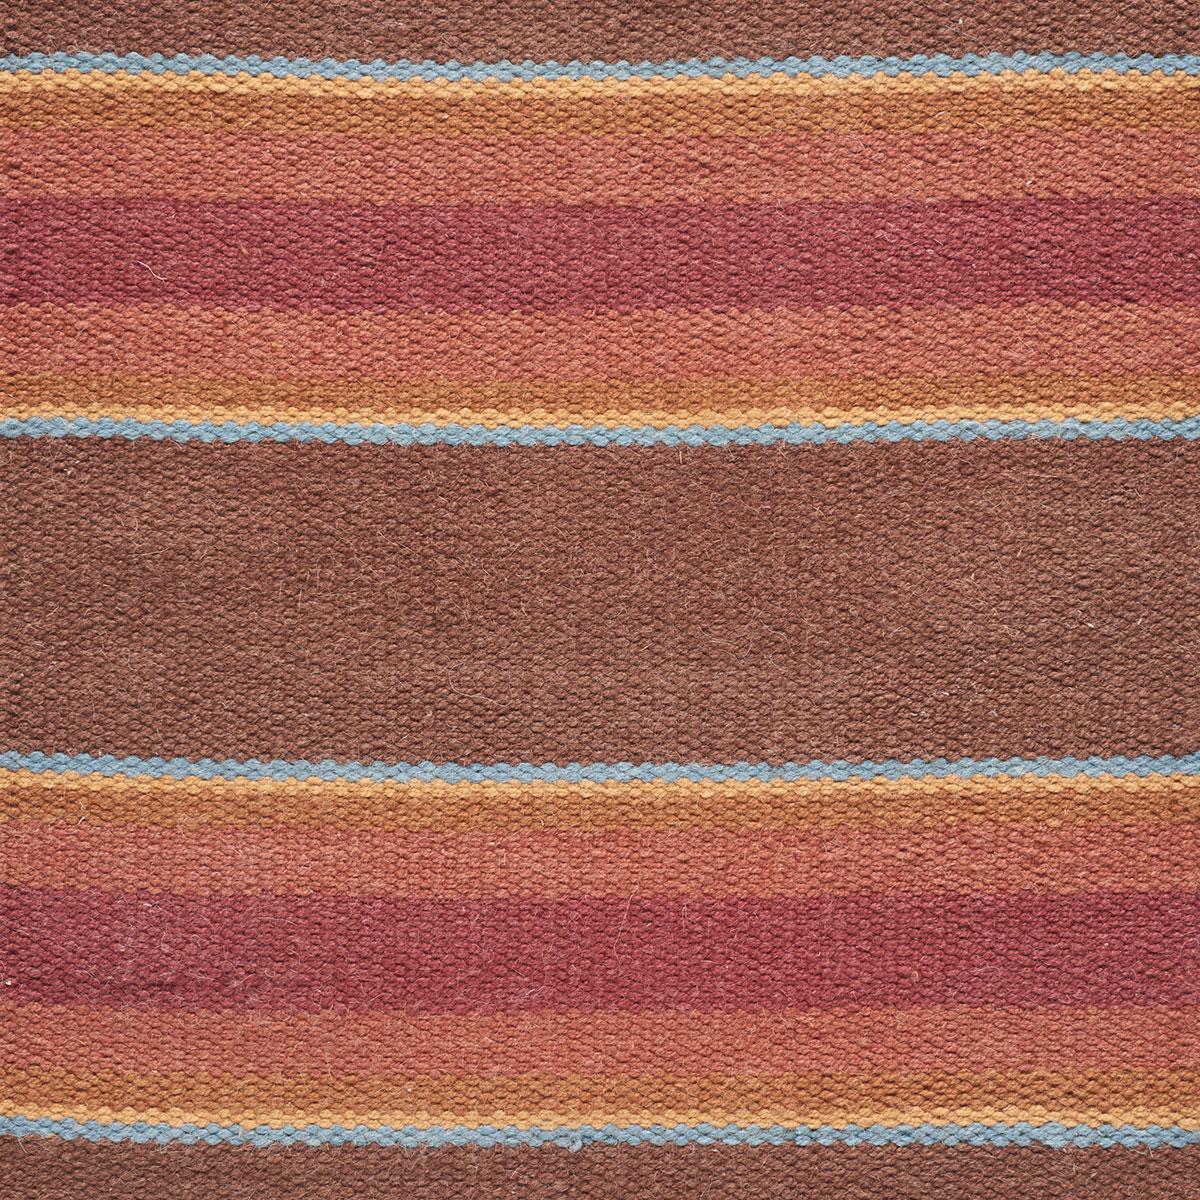 ardent_alpaca-wool_hand-woven_patterson-flynn-martin_pfm